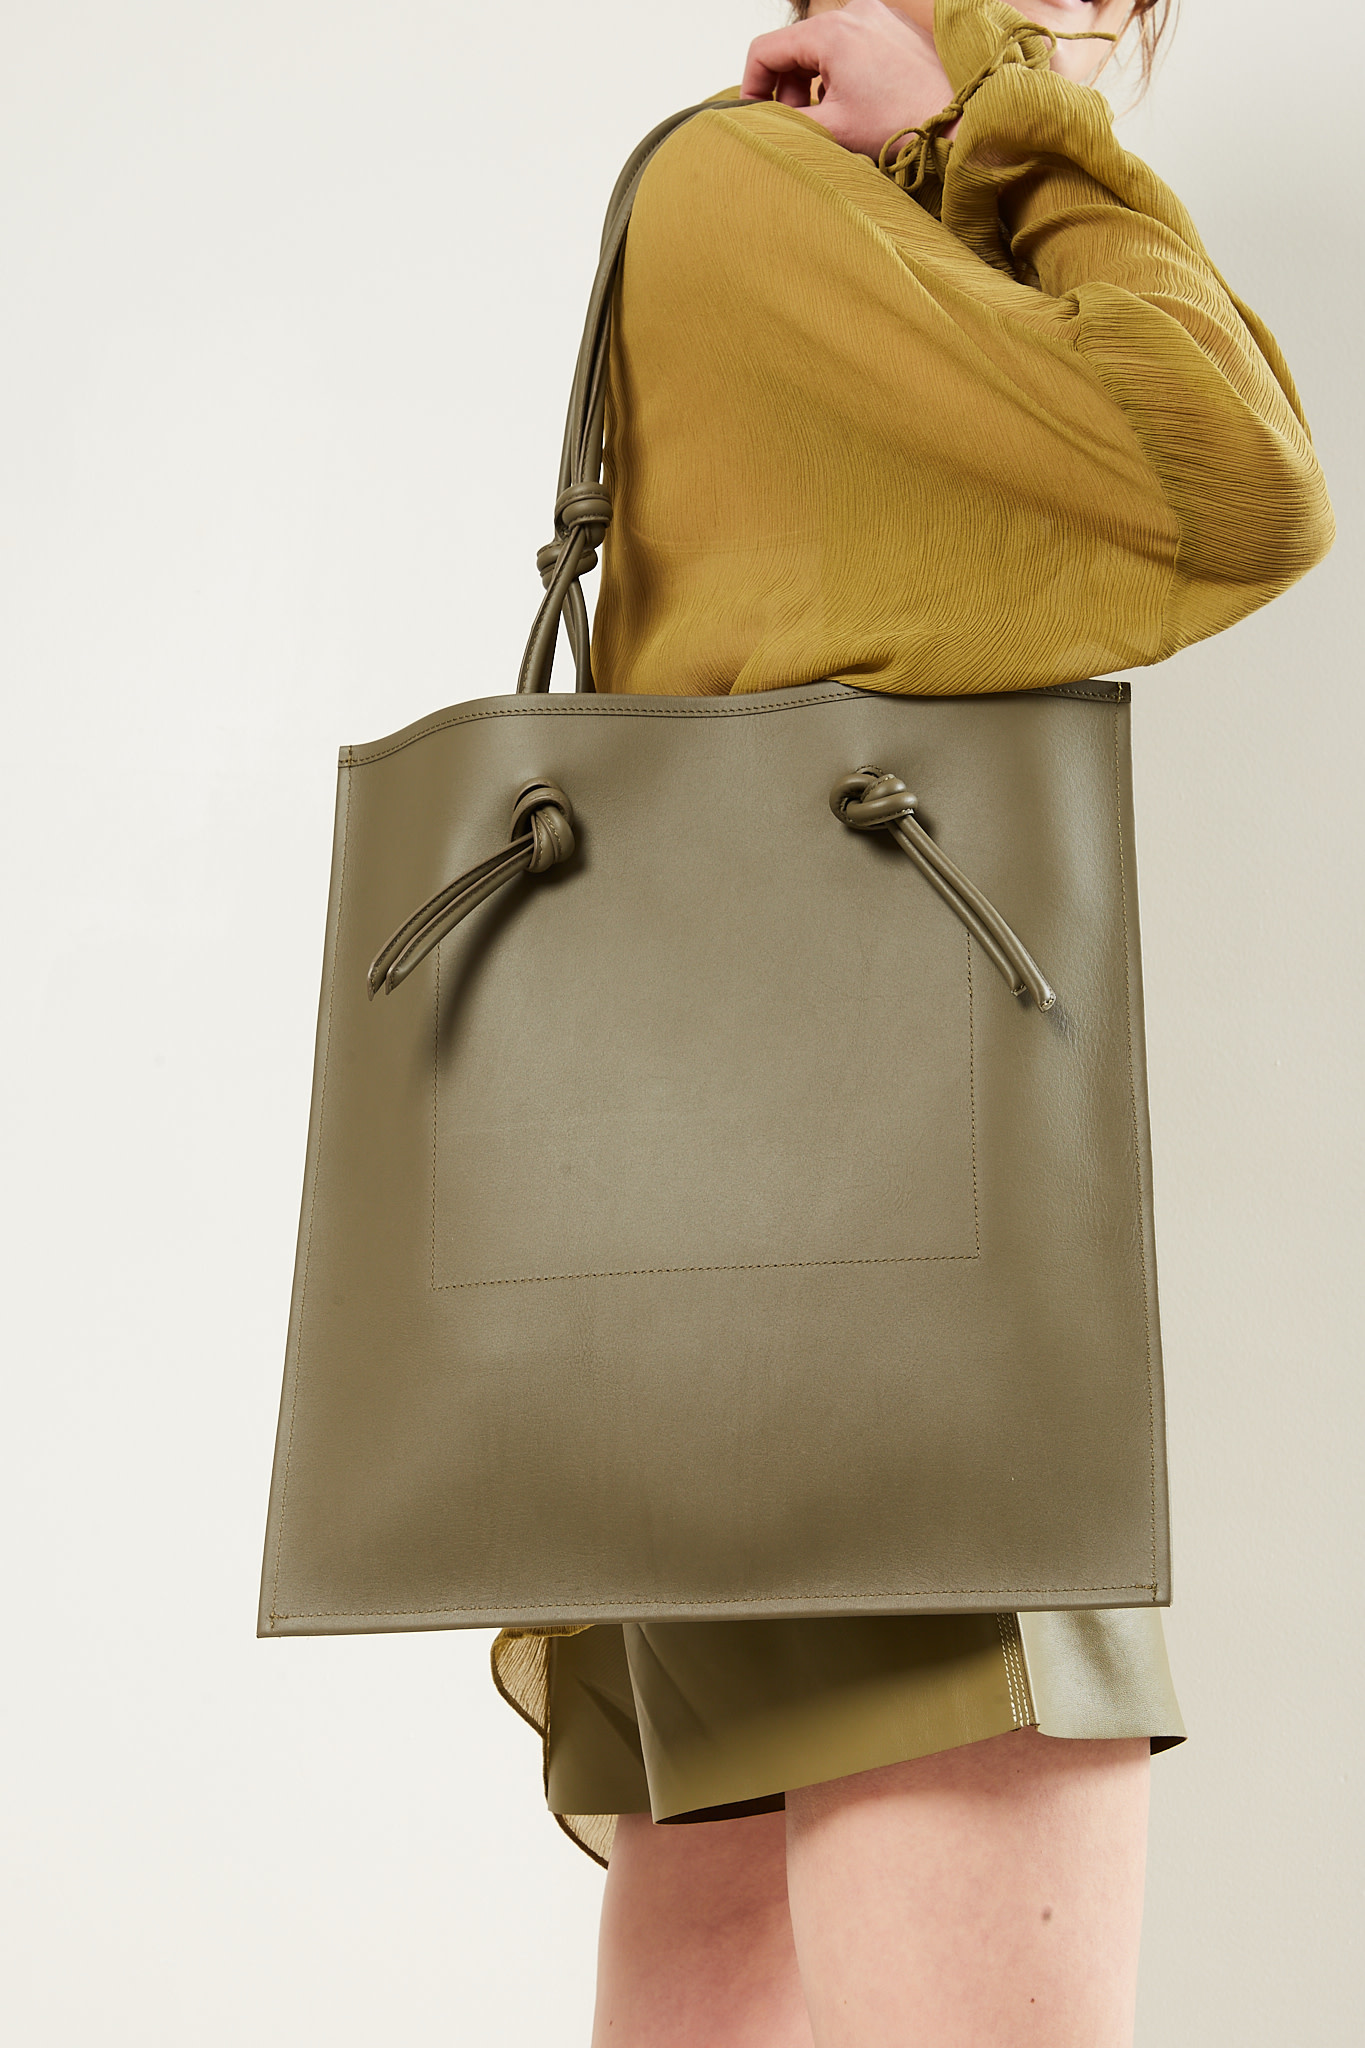 Aeron Beatrice bag